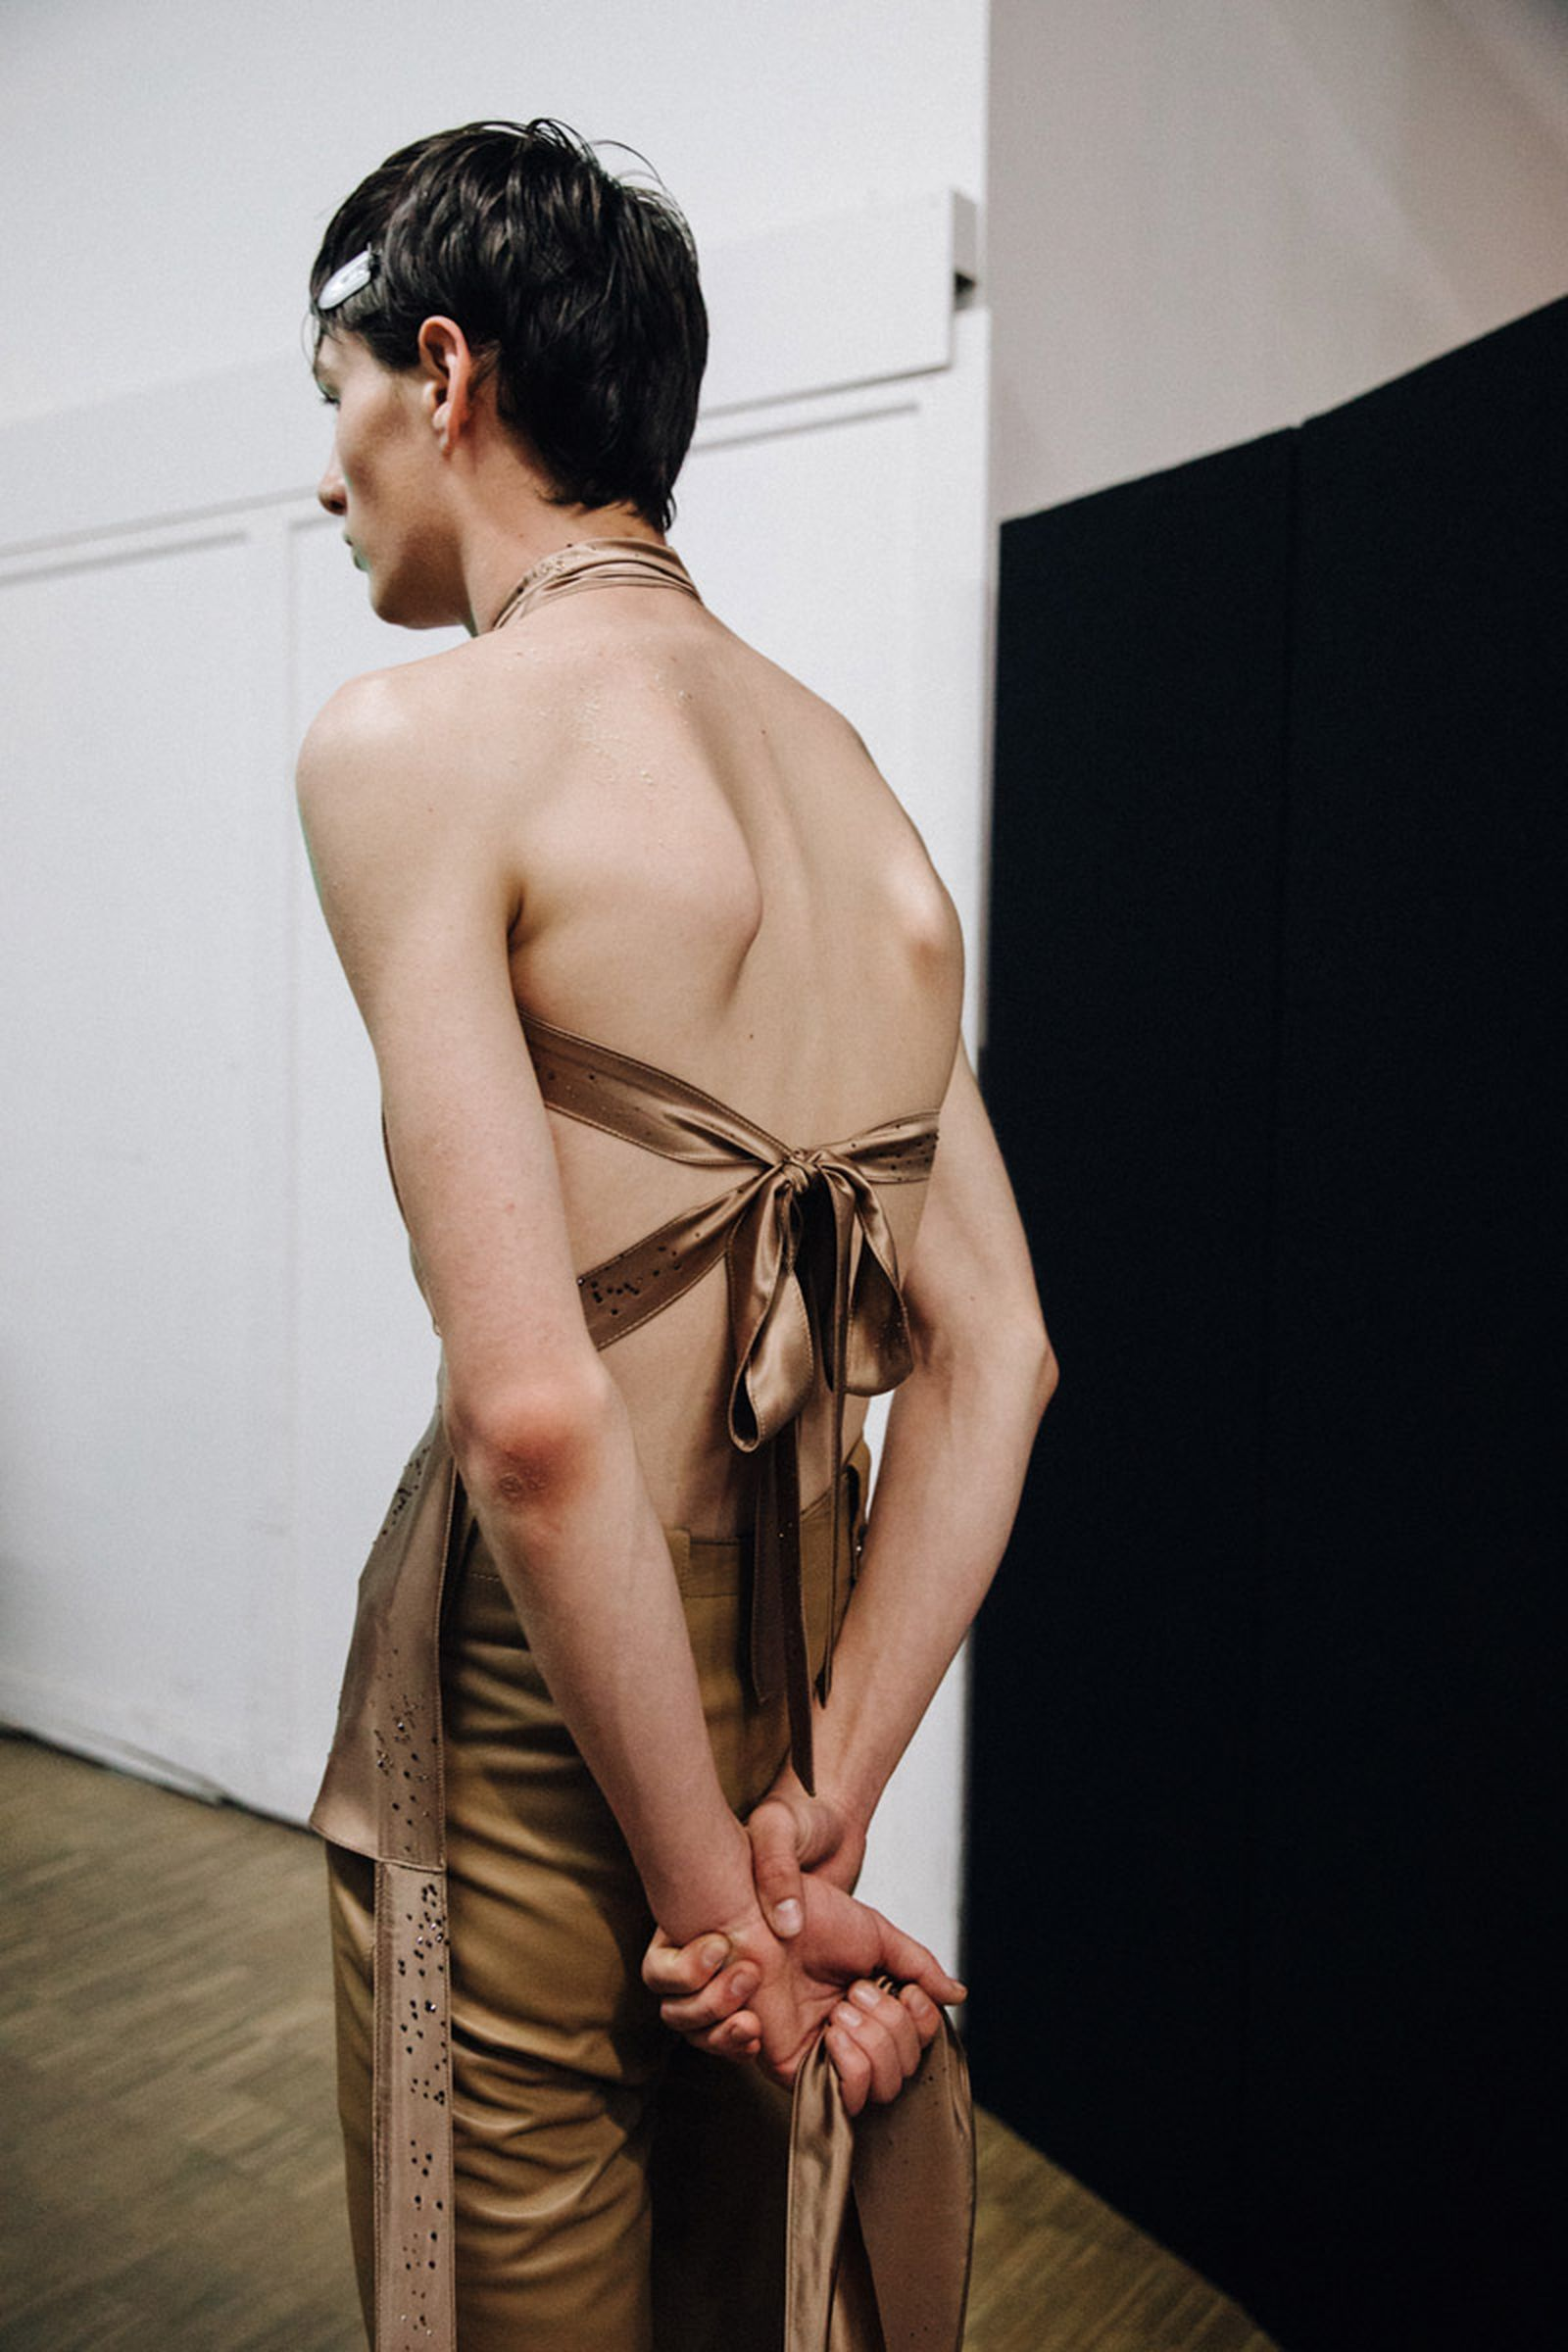 7ludovic de saint serning ss20 paris fashion week runway